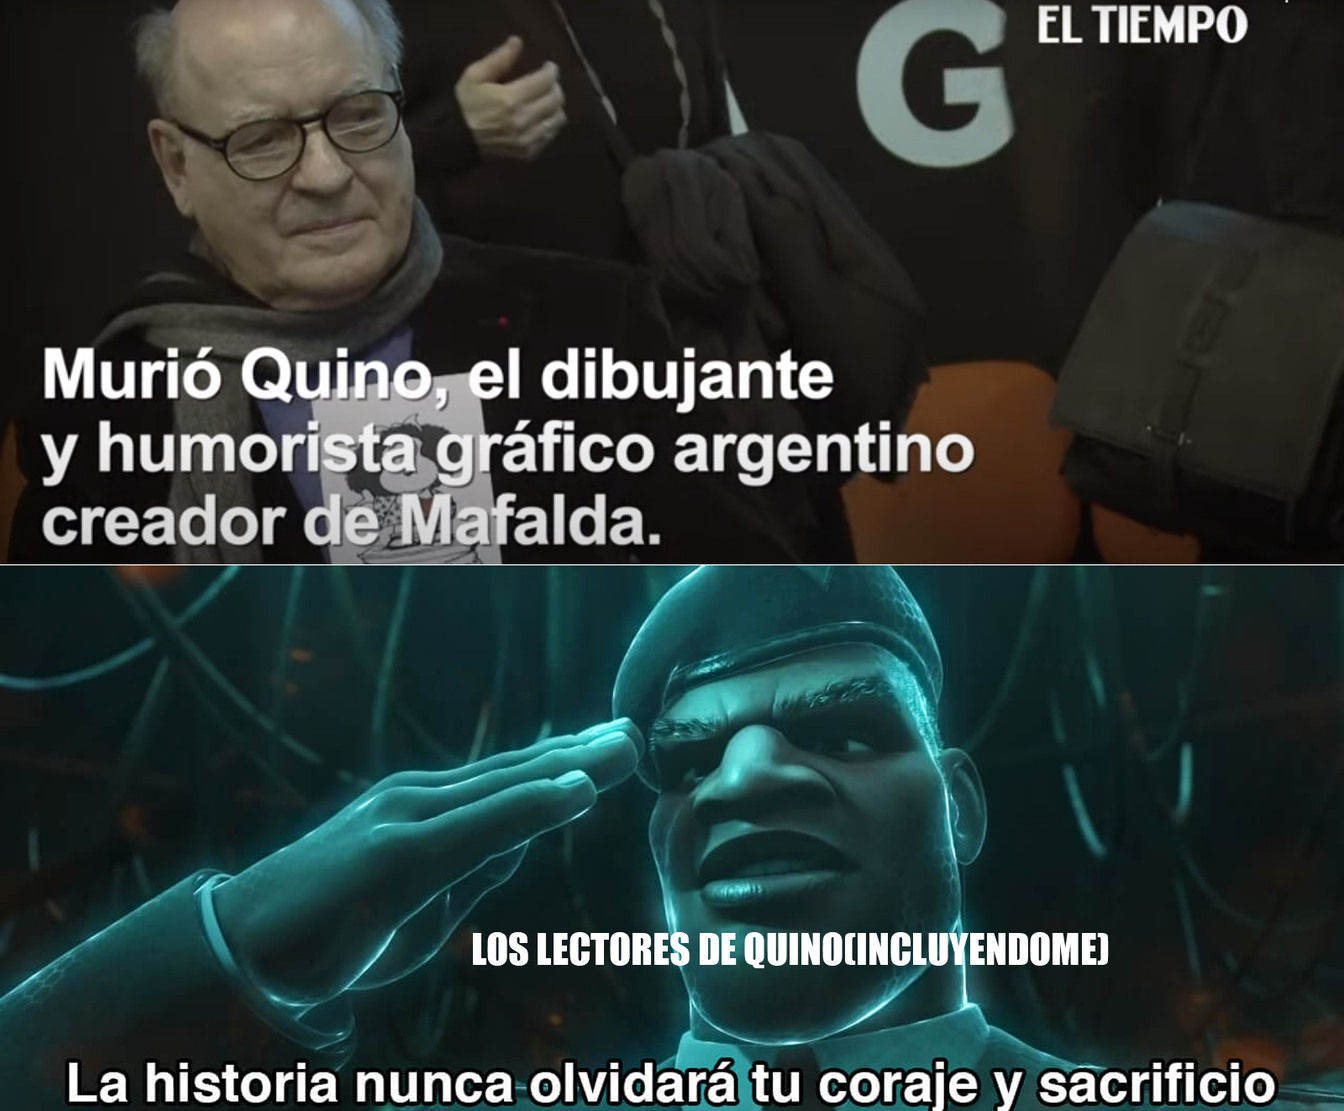 SIN MARCA DE AGUA PARA HONRAR SU MEMORIA - meme